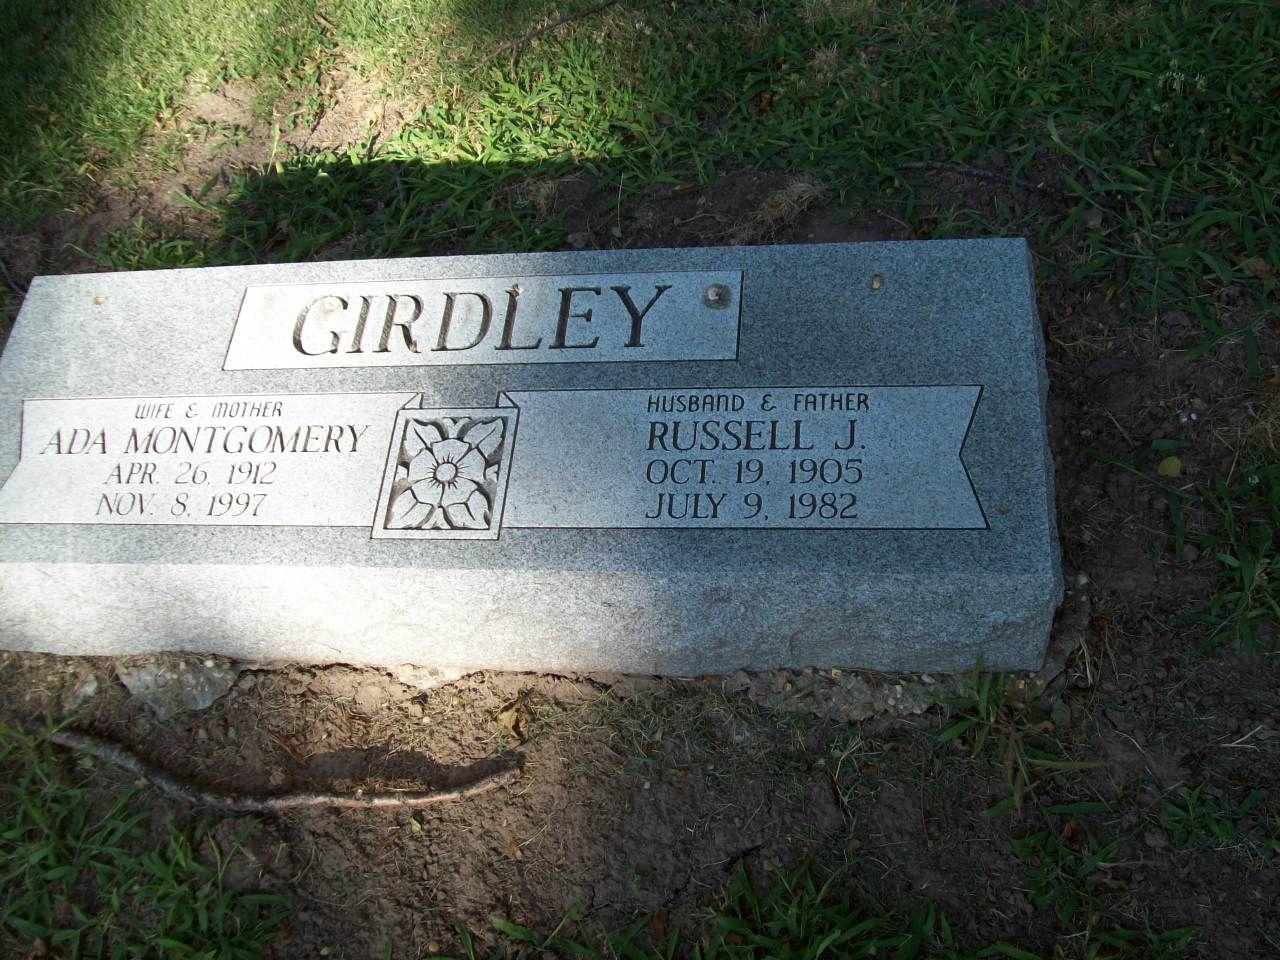 Ada m girdley 1912 1997 find a grave memorial view original kristyandbryce Image collections